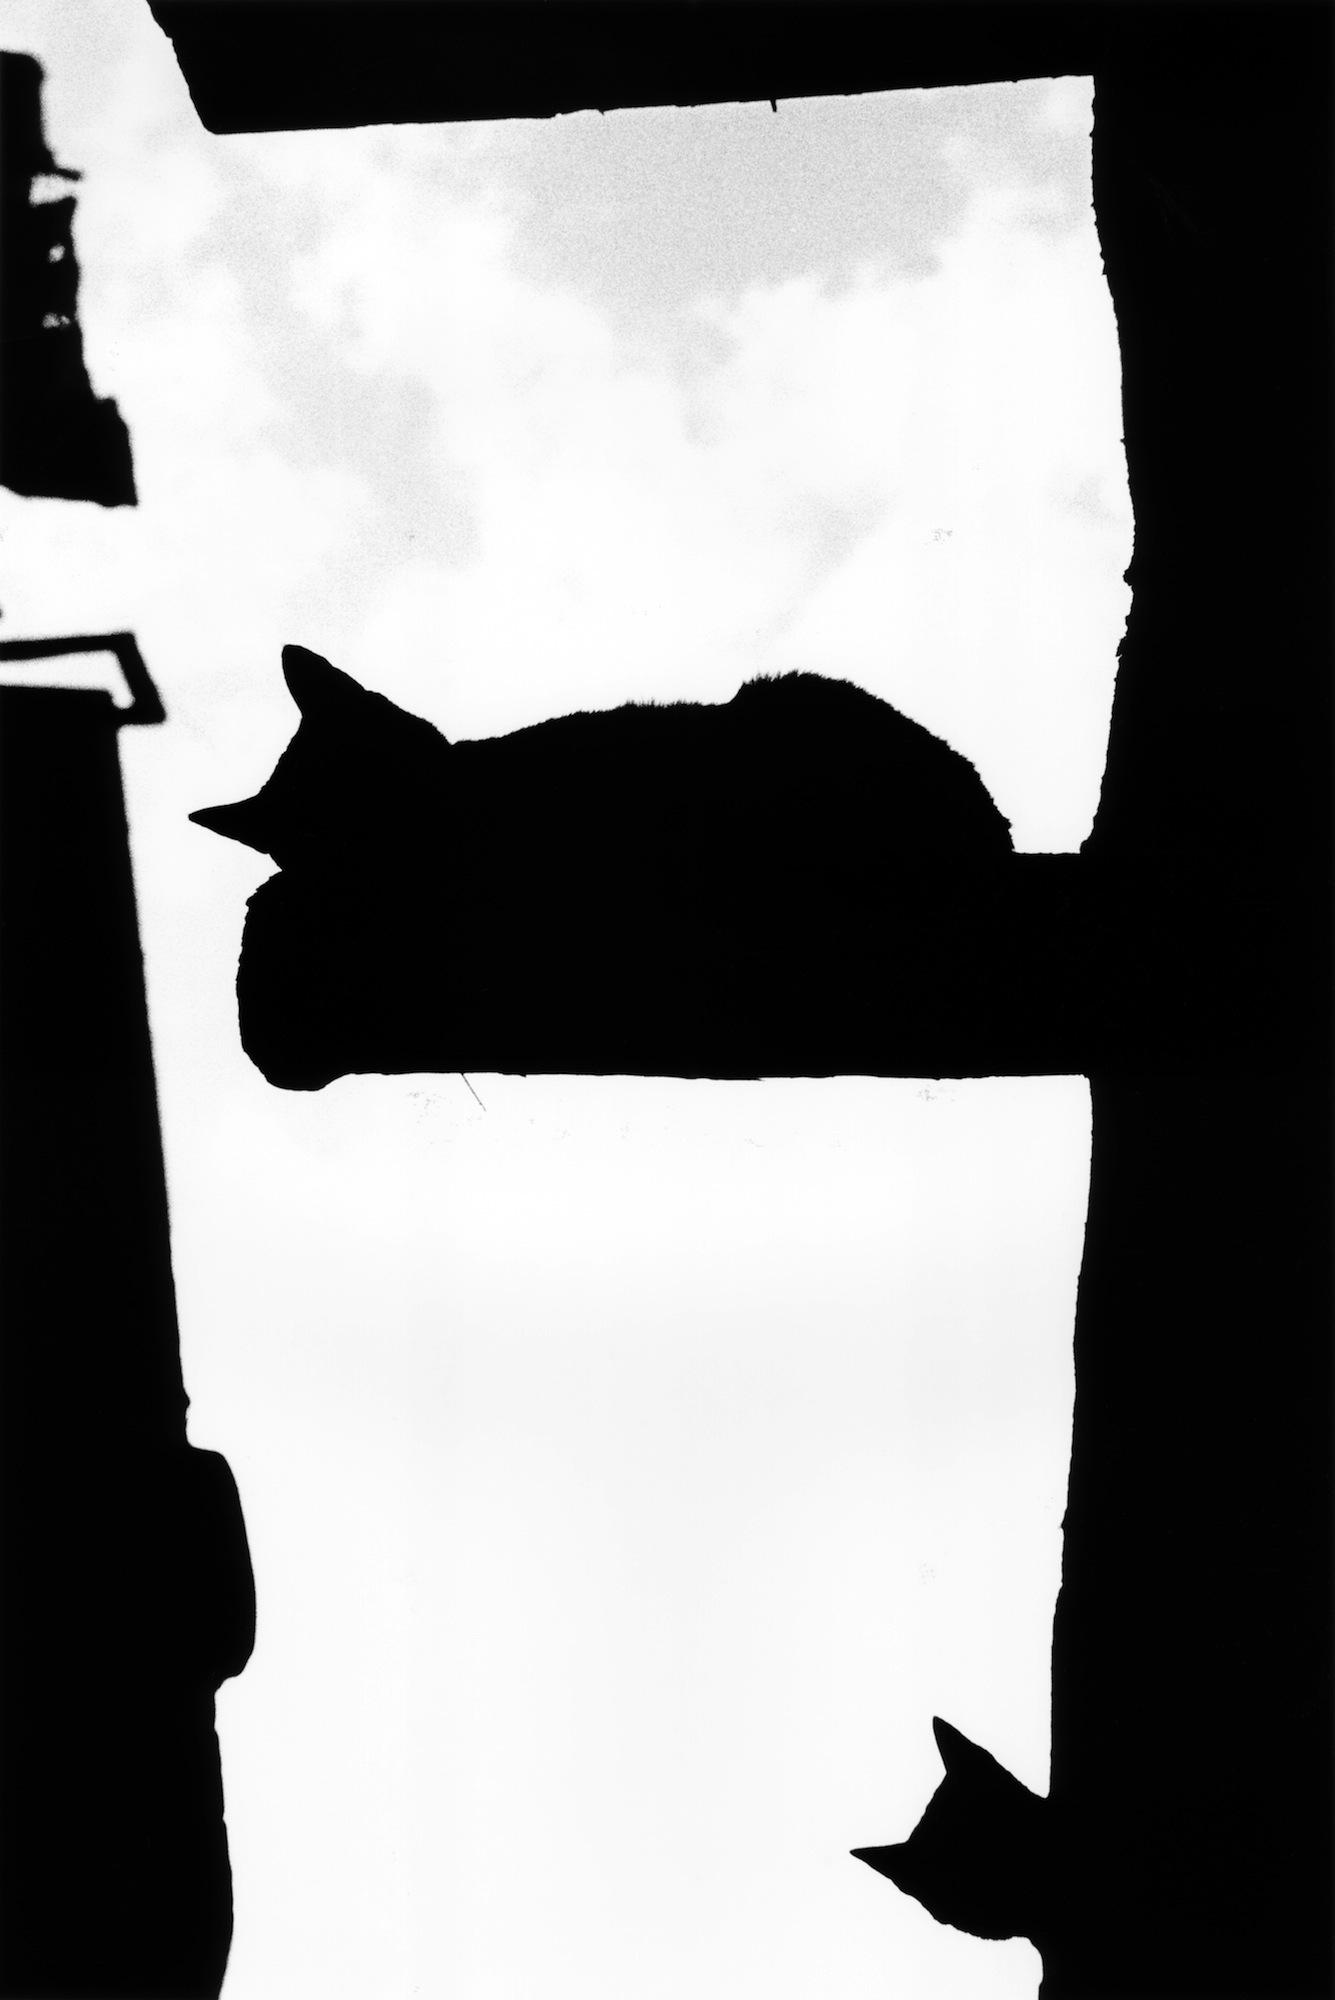 walter_rothwell_photography_cats-012.jpg